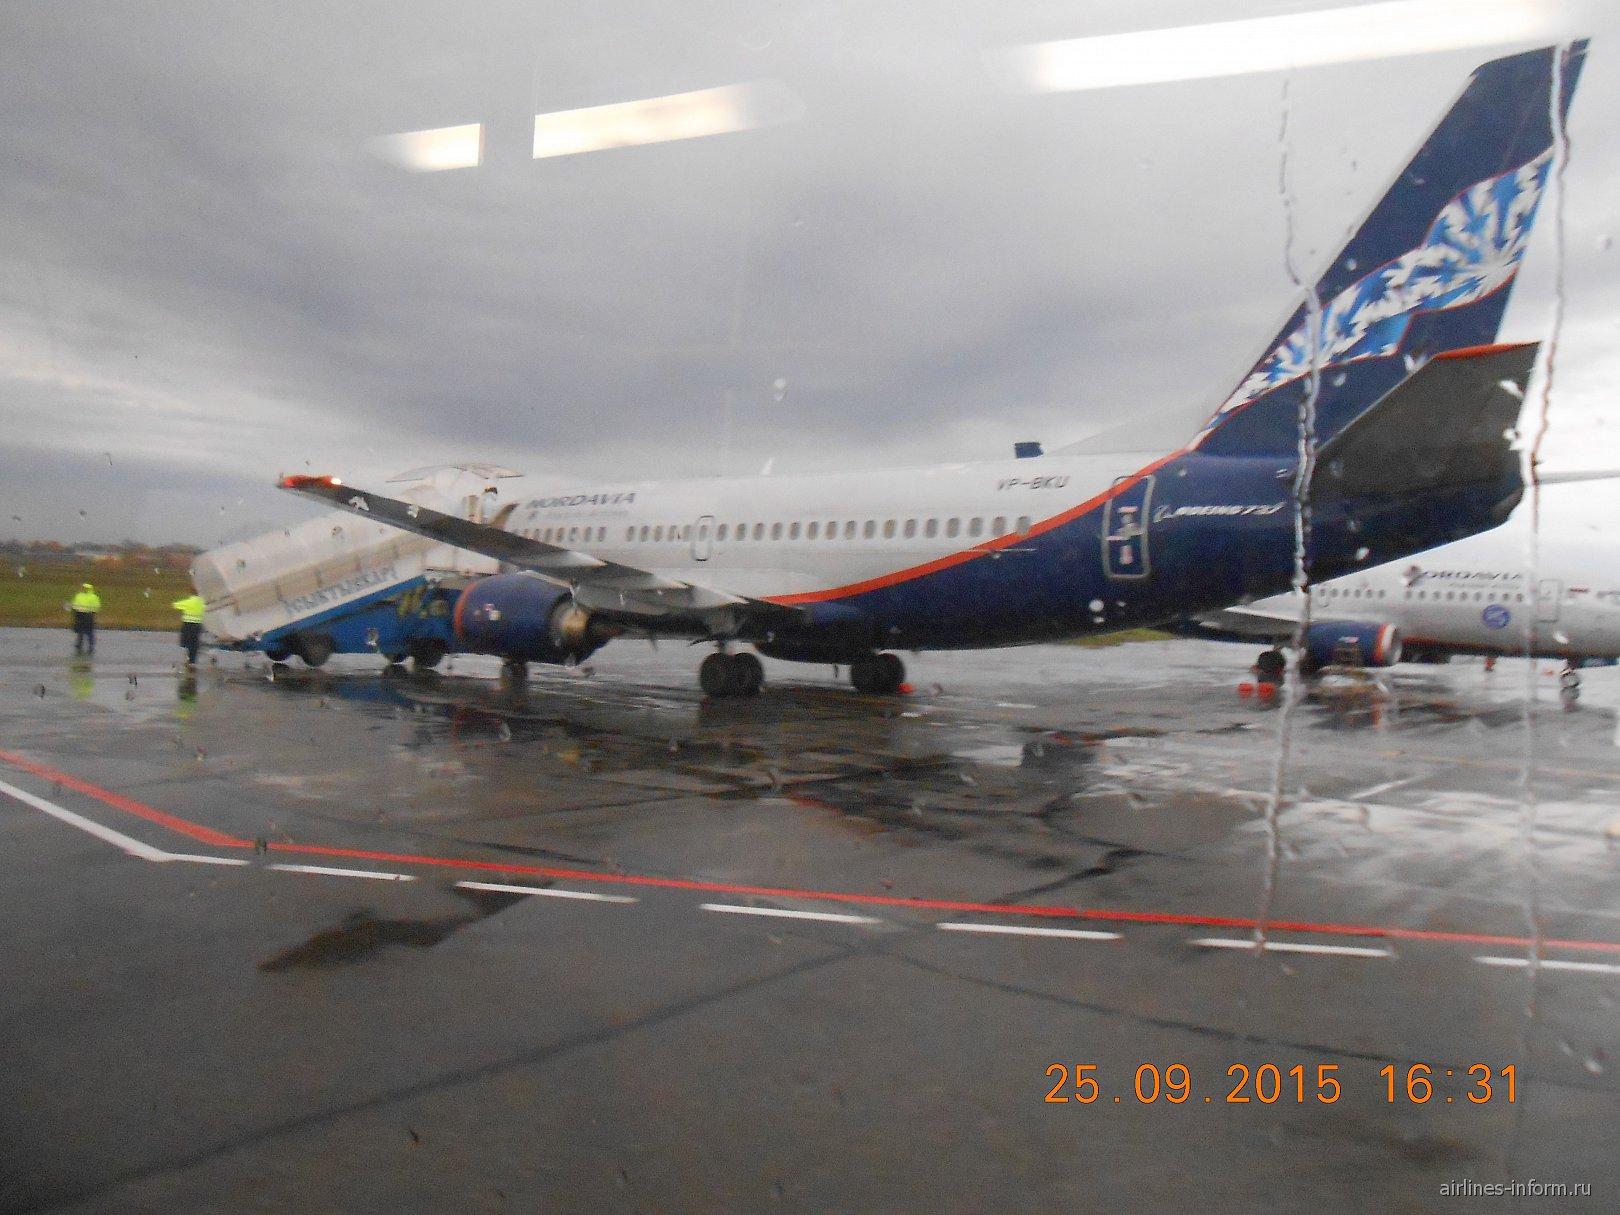 Перелет Сыктывкар - Санкт-Петербург с Nordavia